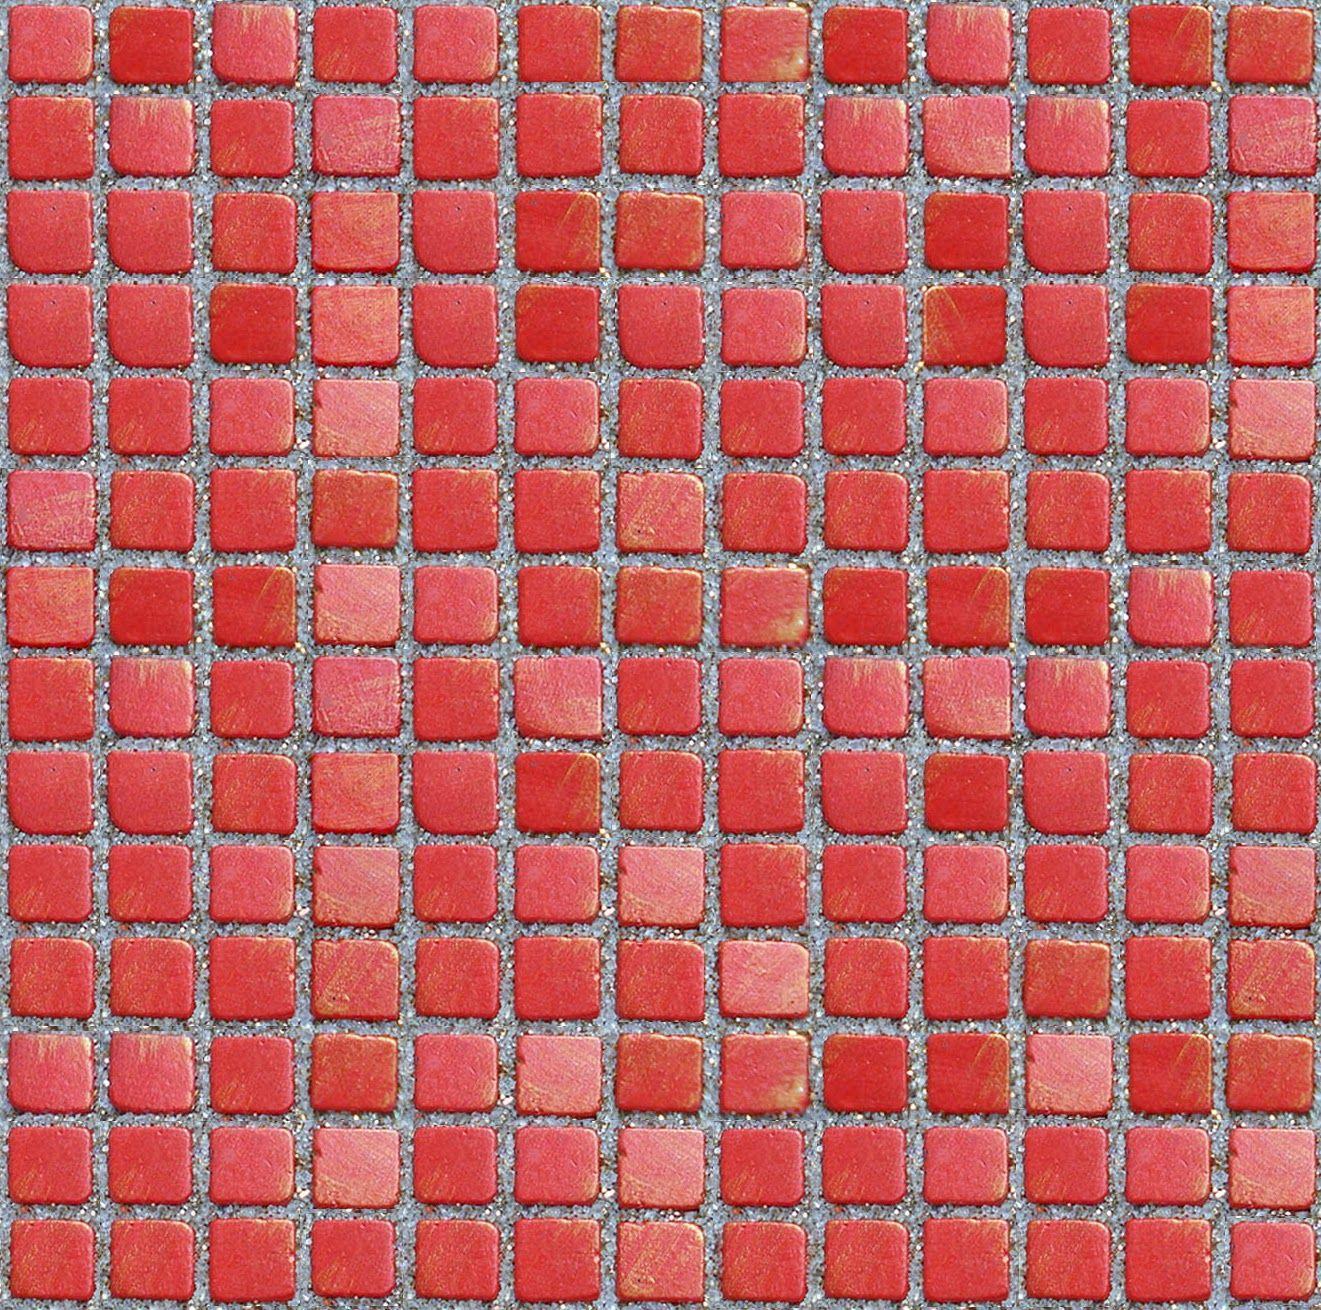 Tileable Red Mosaic Texture Maps Texturise Tiles Texture Paving Texture Texture Mapping